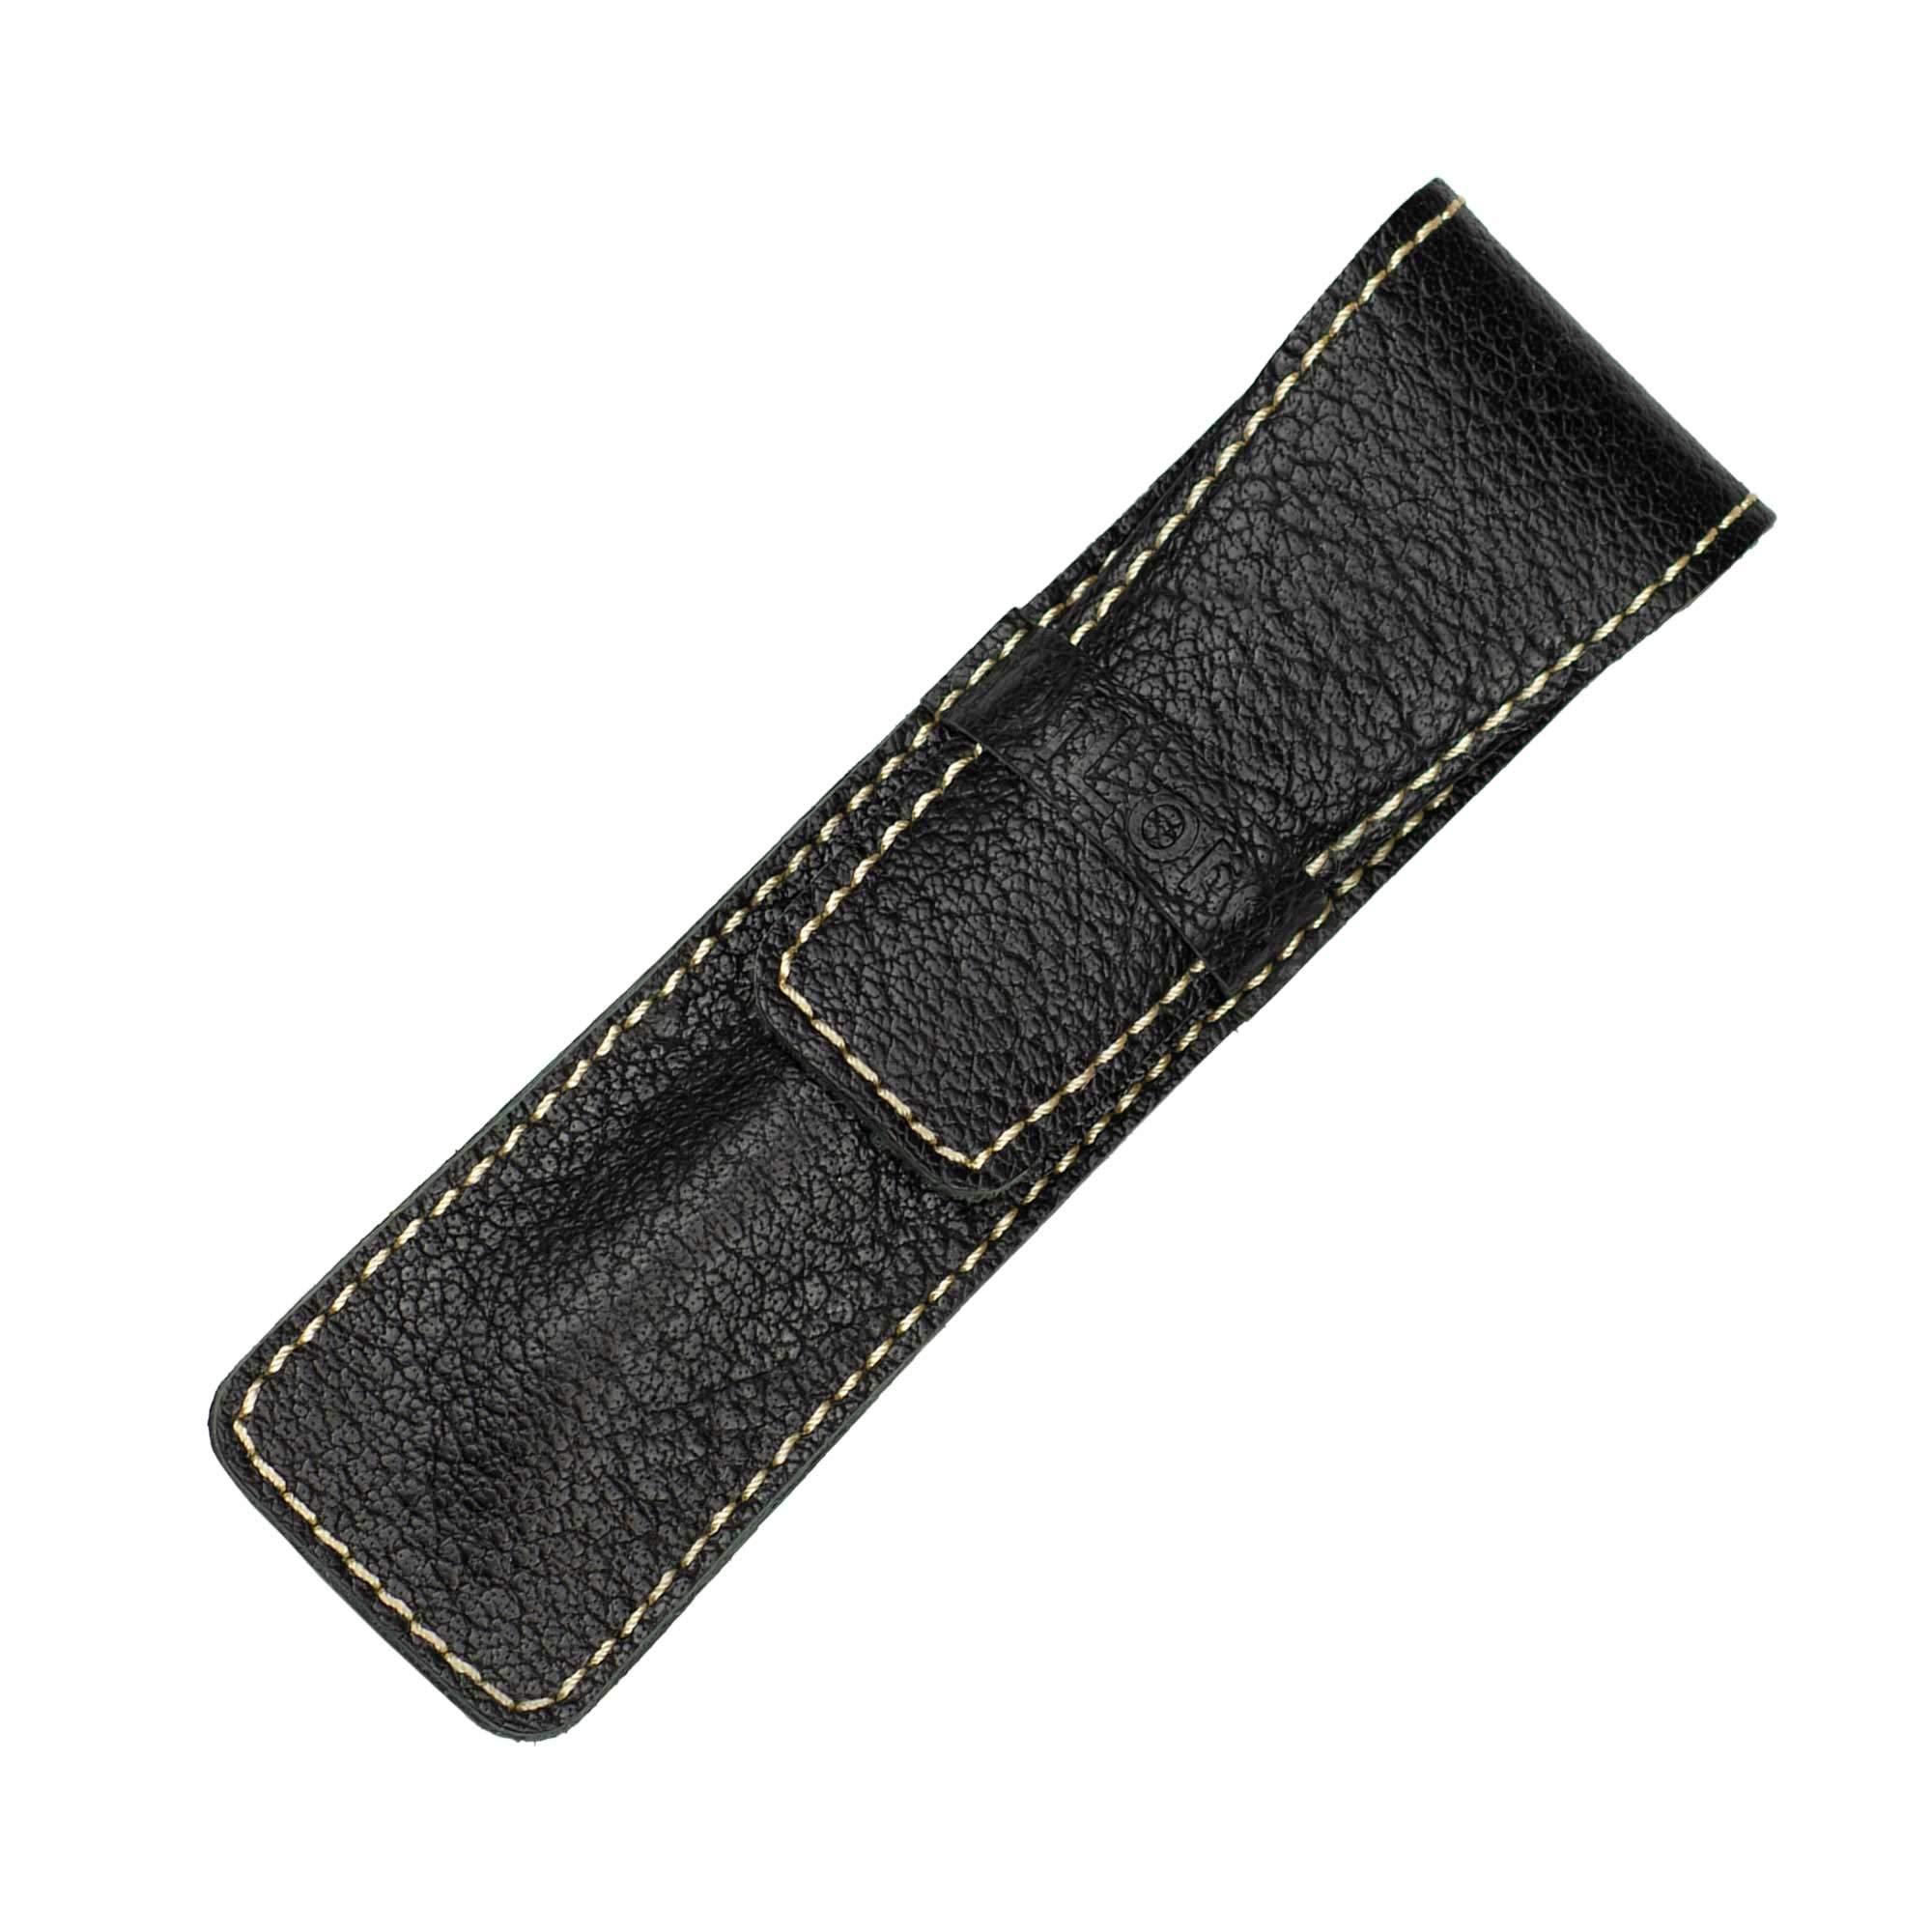 DiLoro Full Grain Top Quality Thick Buffalo Leather Single Pen Case Holder Buffalo Black